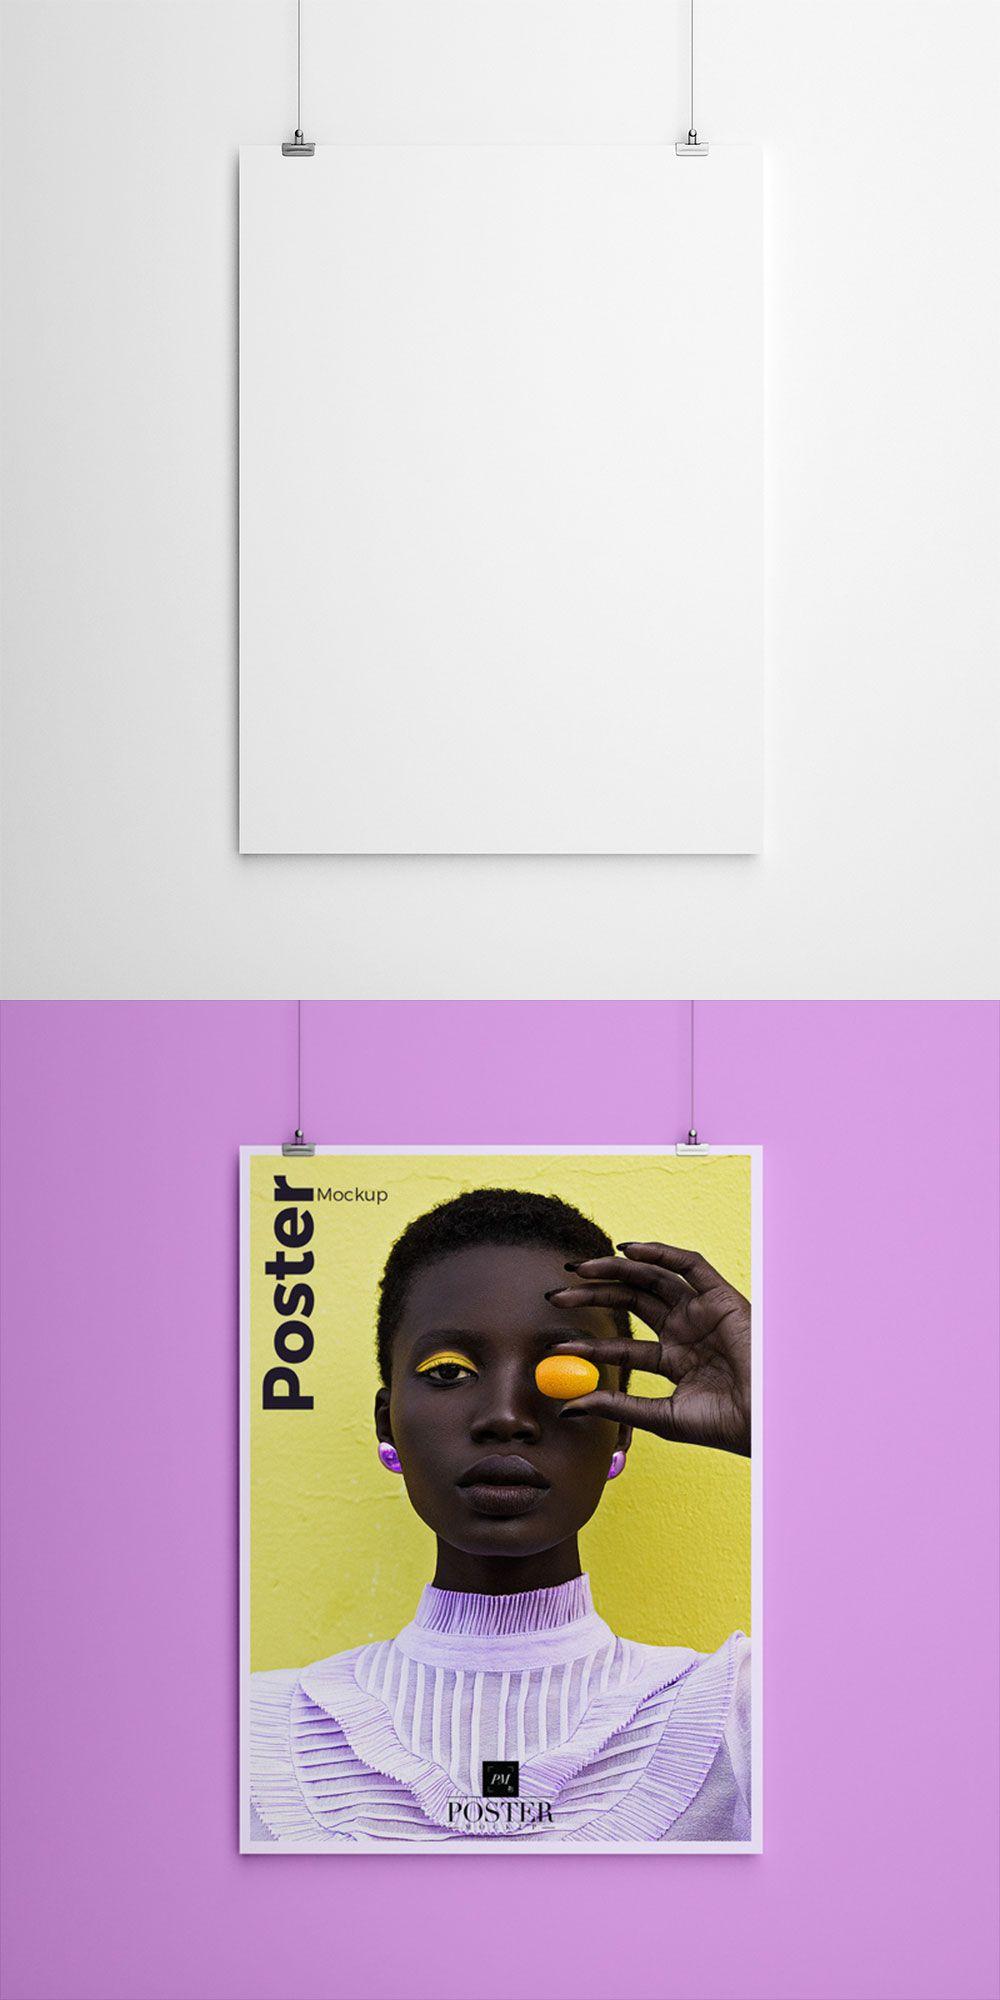 Free Hanging Clips Poster Mockup Poster Mockup Free Poster Mockup Frame Mockup Free